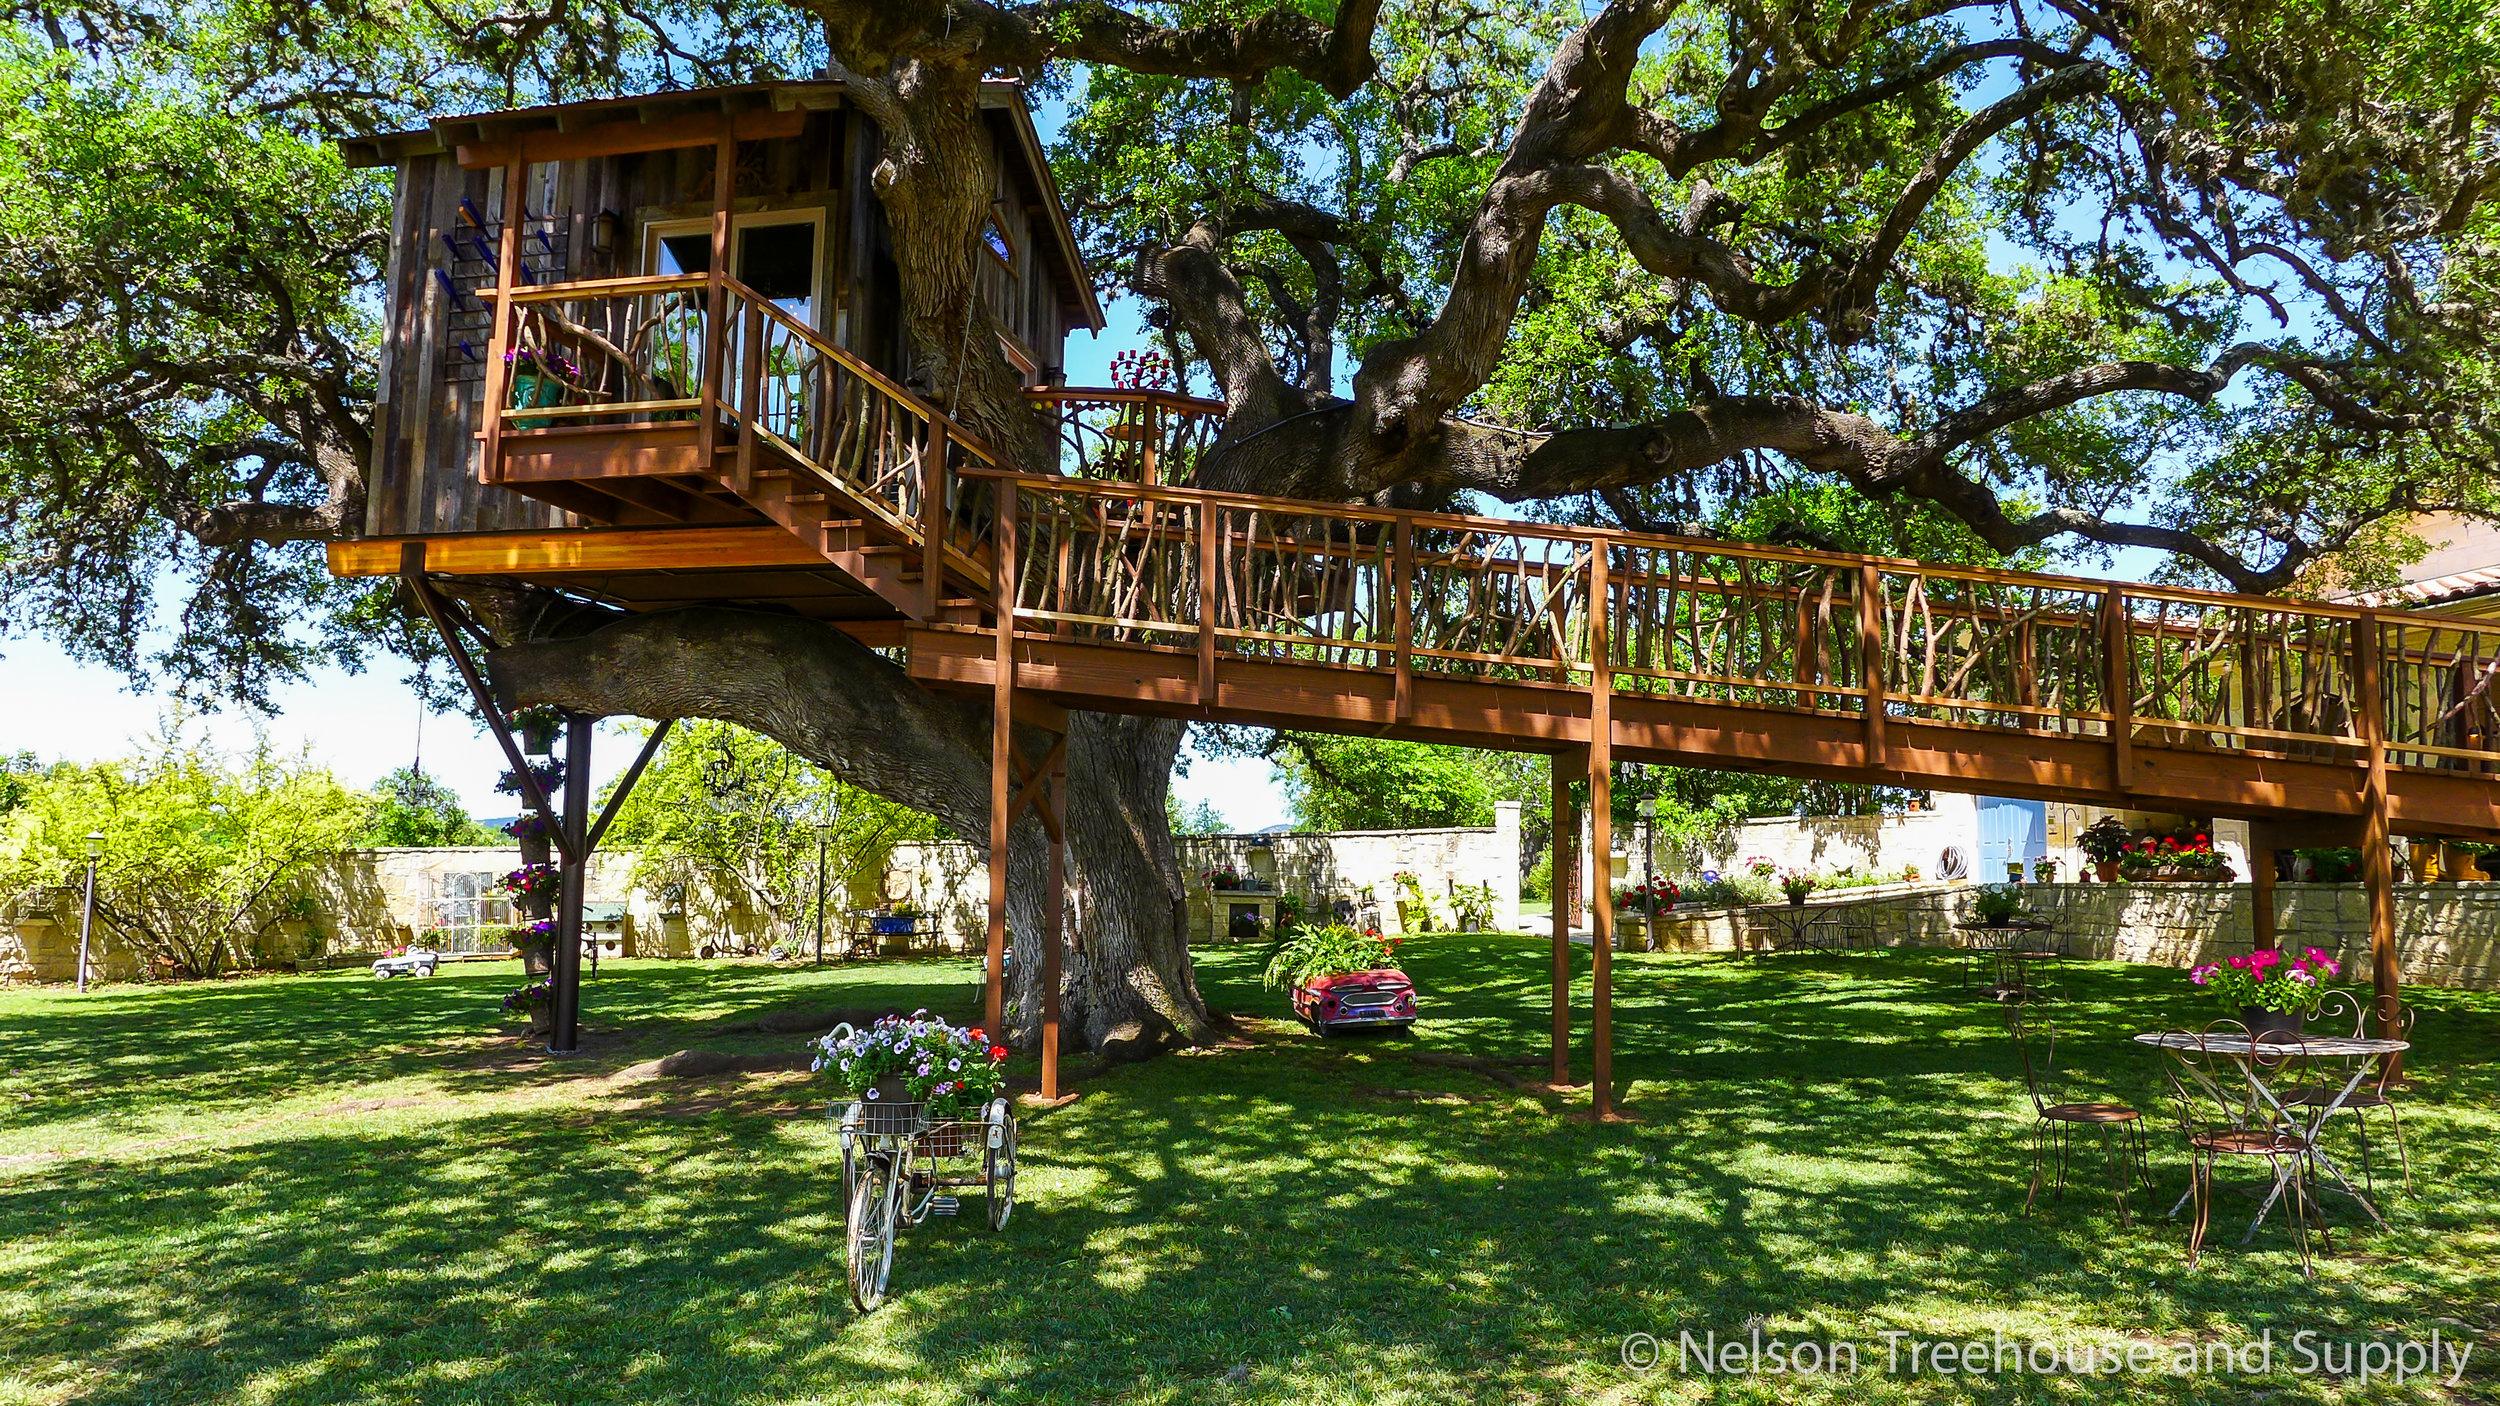 laurel-restaurant-treehouse-exterior-3